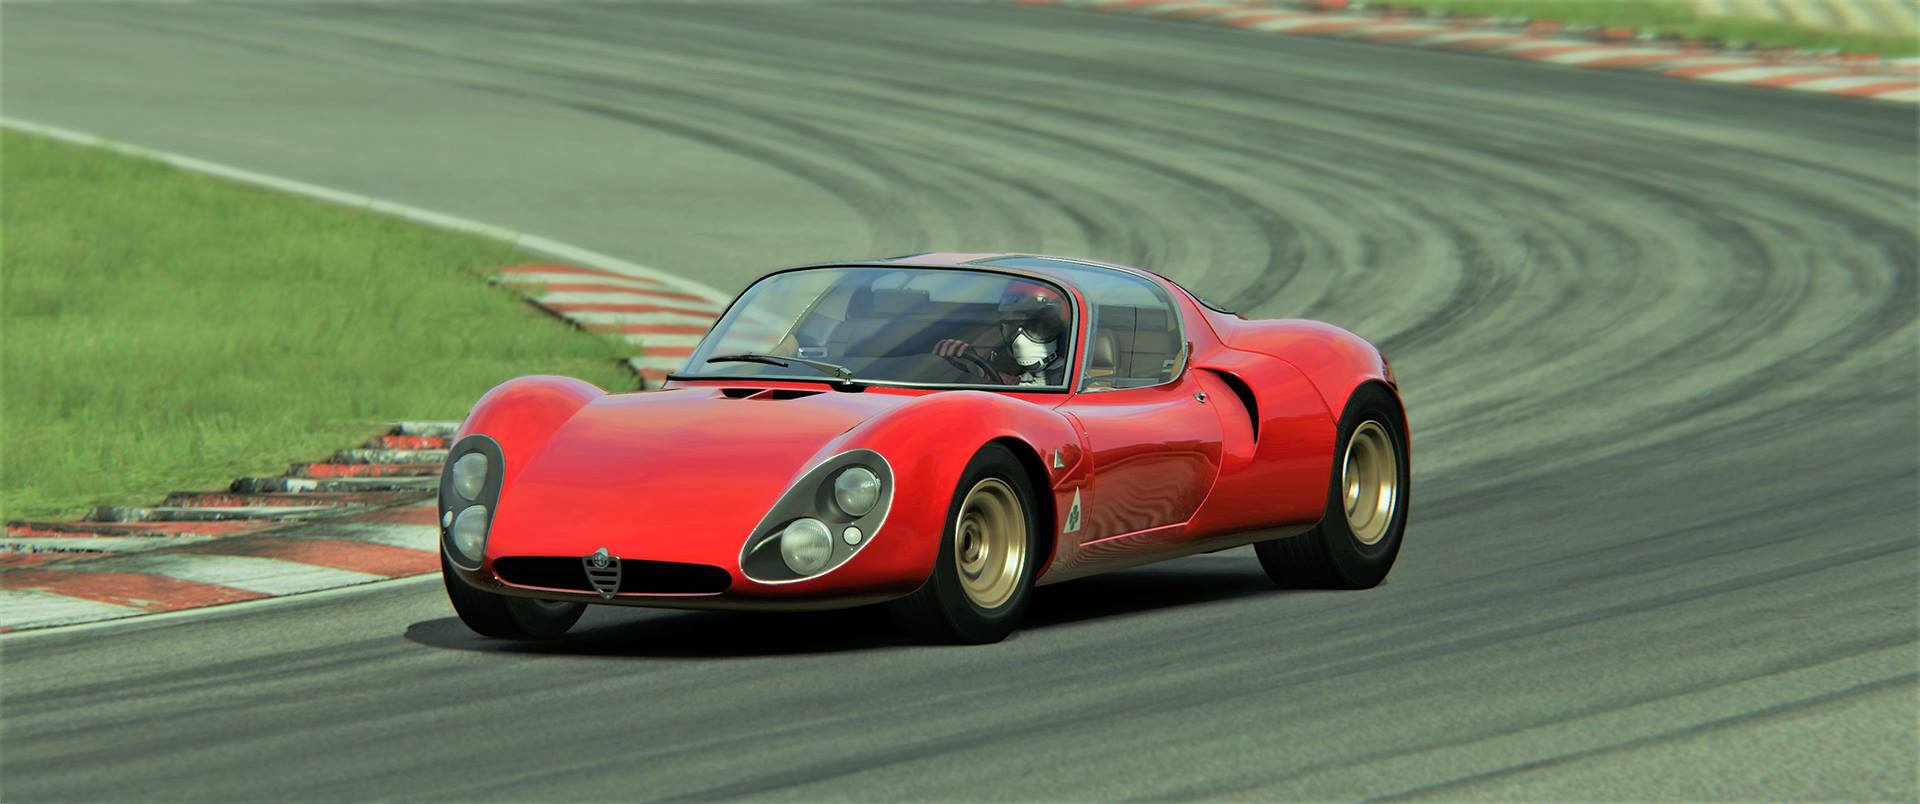 Assetto Corsa Tipo 33 stradale 2.jpg